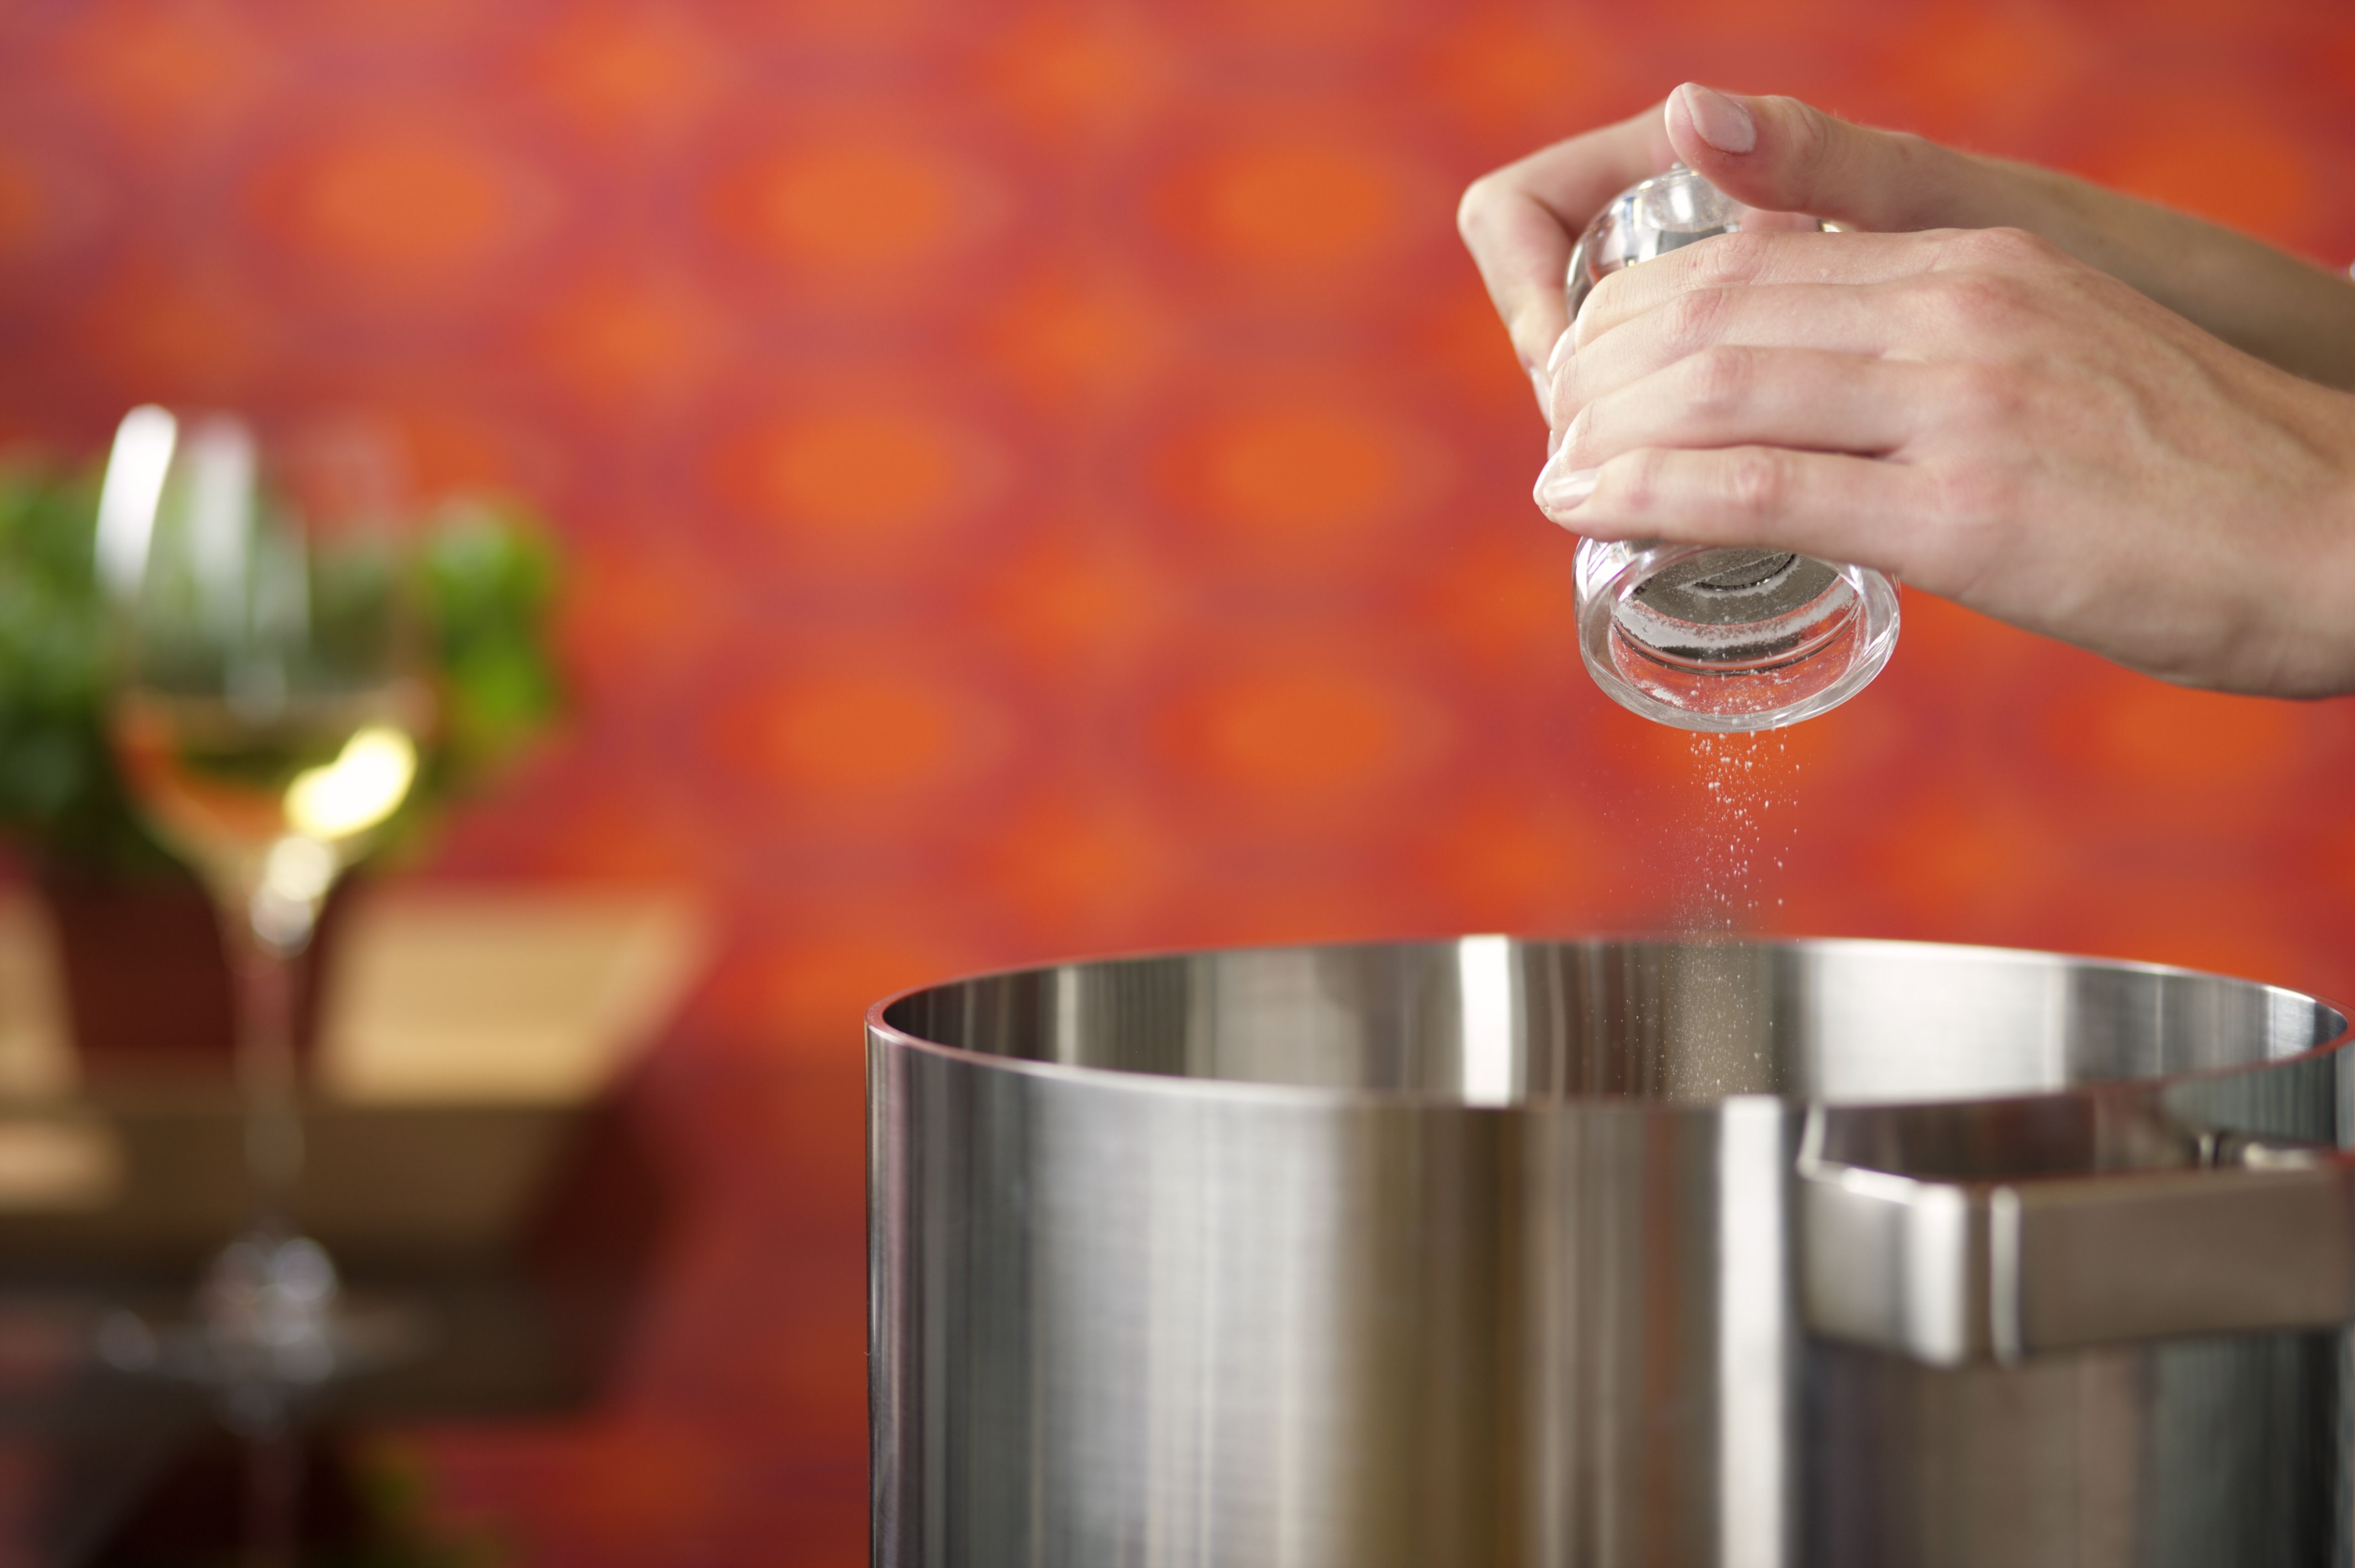 salt shaker cooking